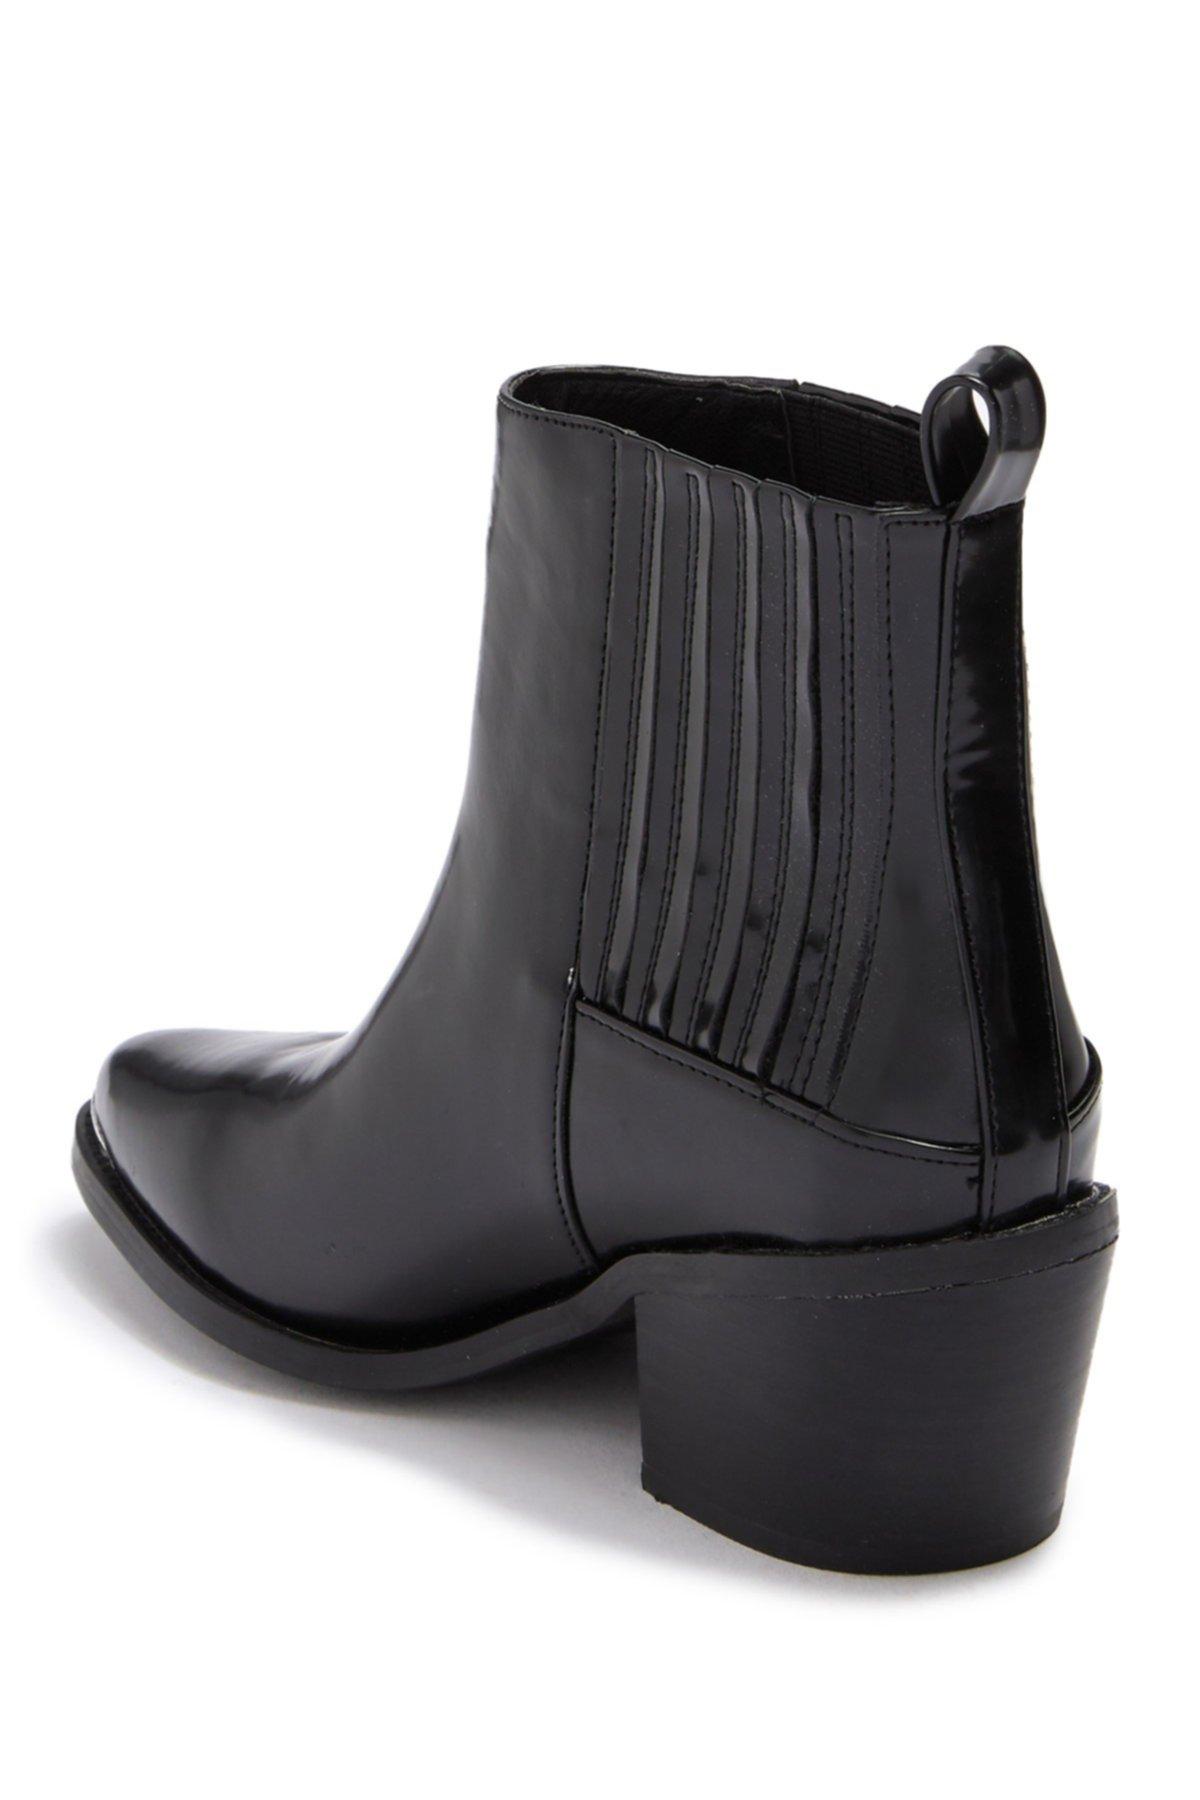 Ozias Chelsea Boot Dolce Vita